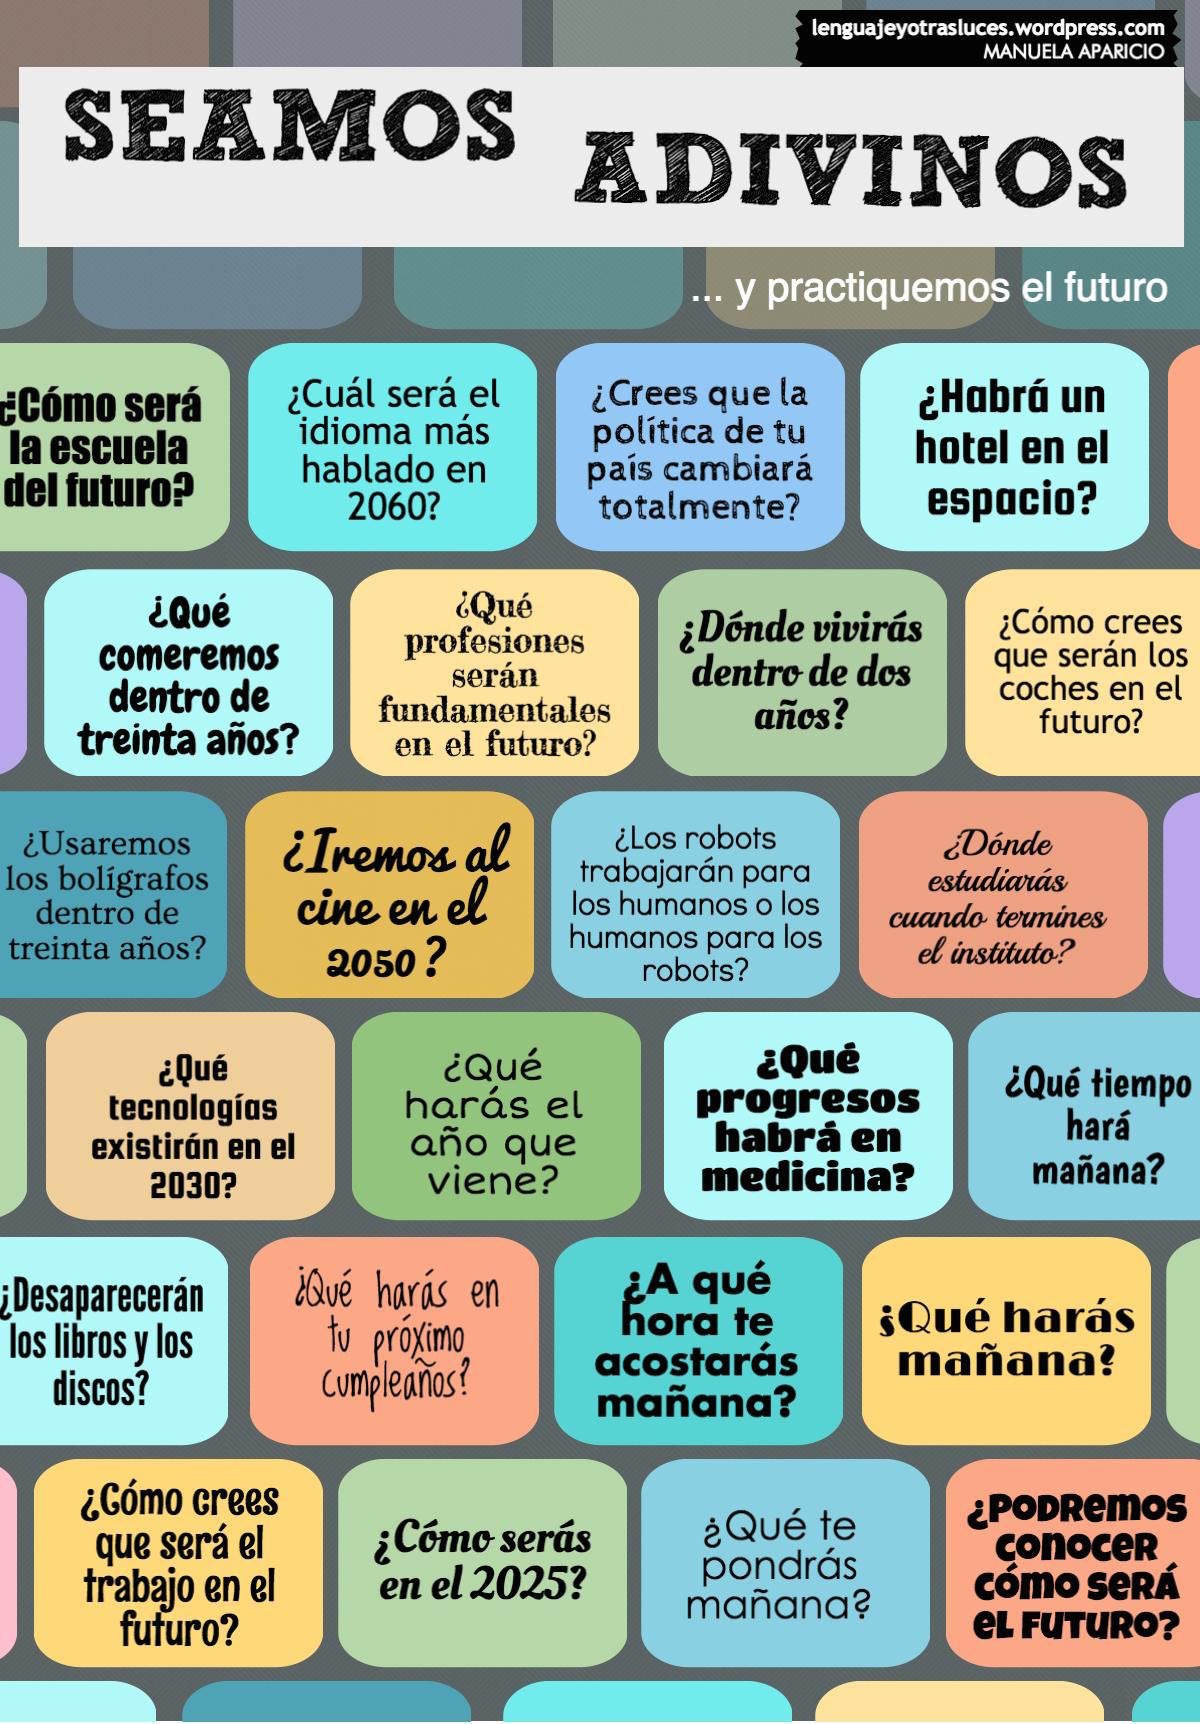 Future Tense Regular And Irregular Verbs Spanish Class